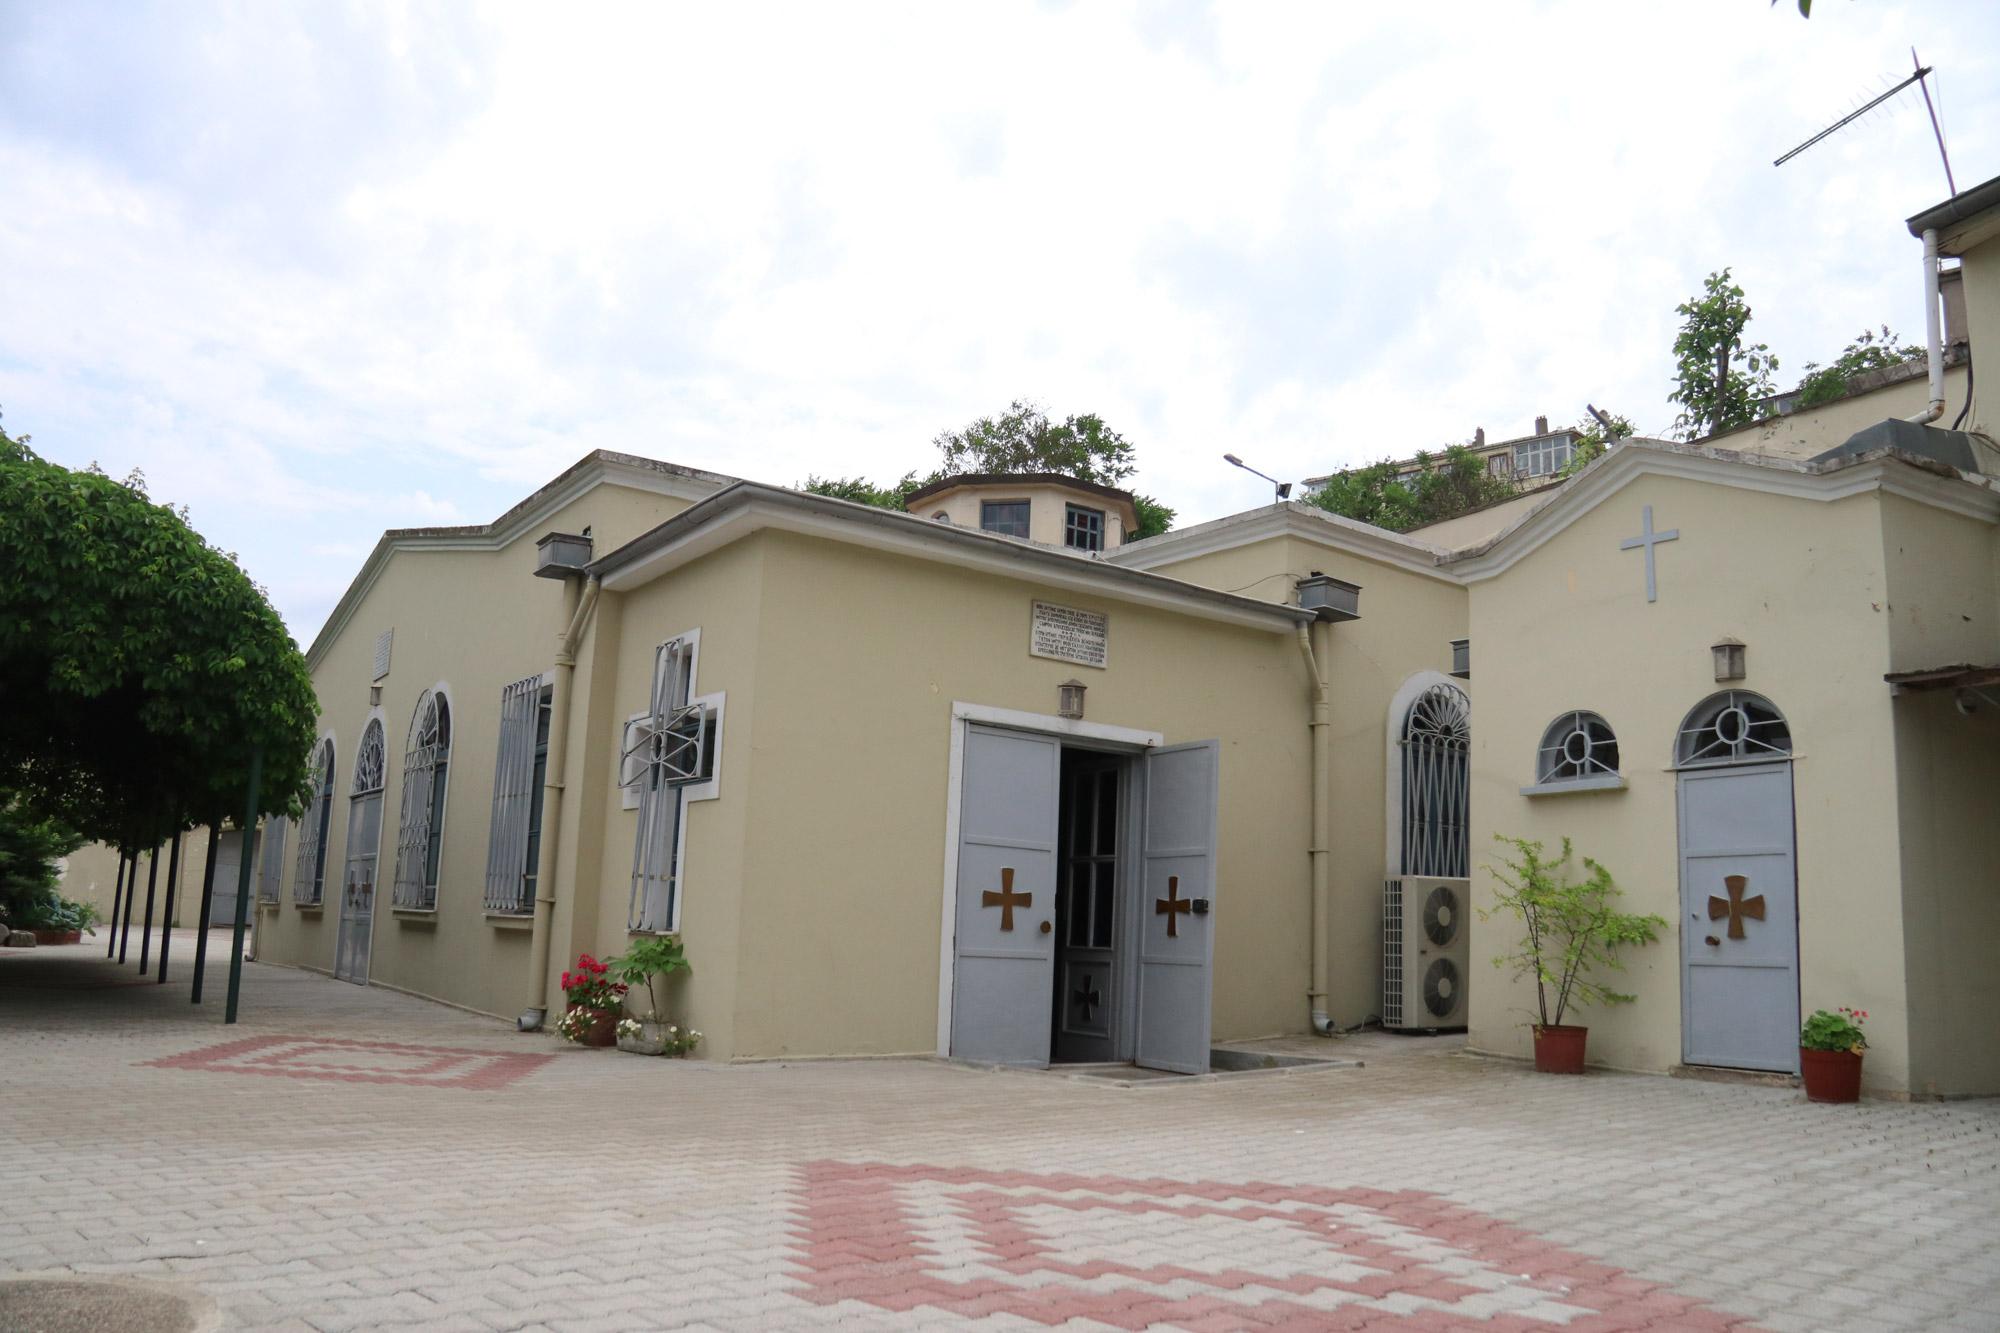 Stedentrip Istanbul - Meryen Ana Kilisesi